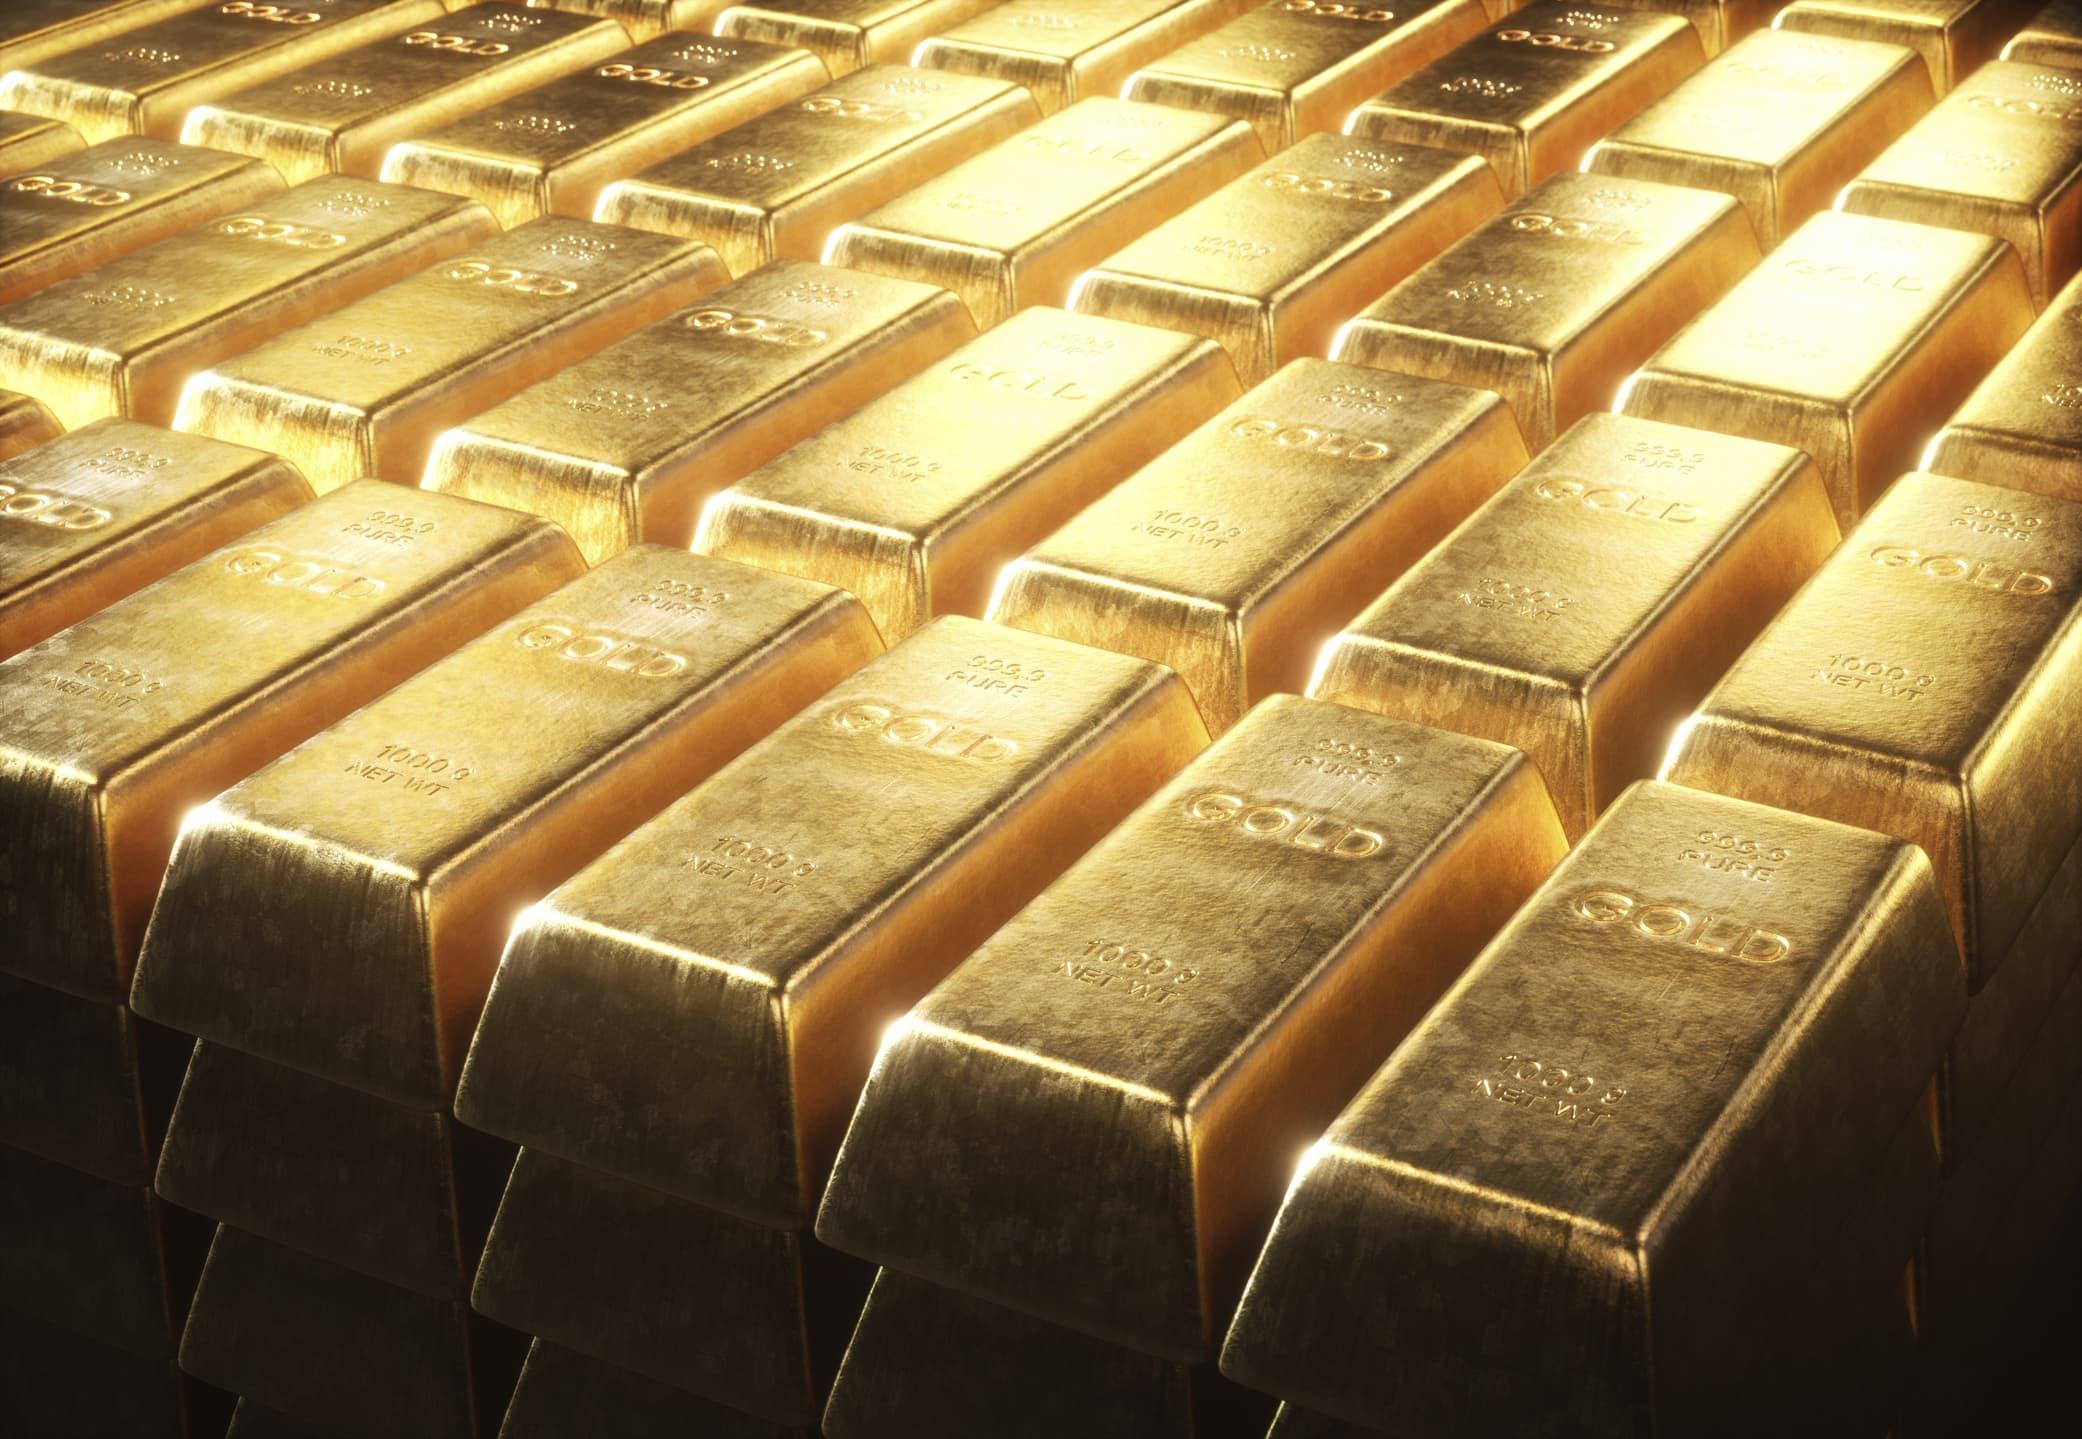 Gold prices surge to record high amid coronavirus worries, U.S.-China tensions thumbnail